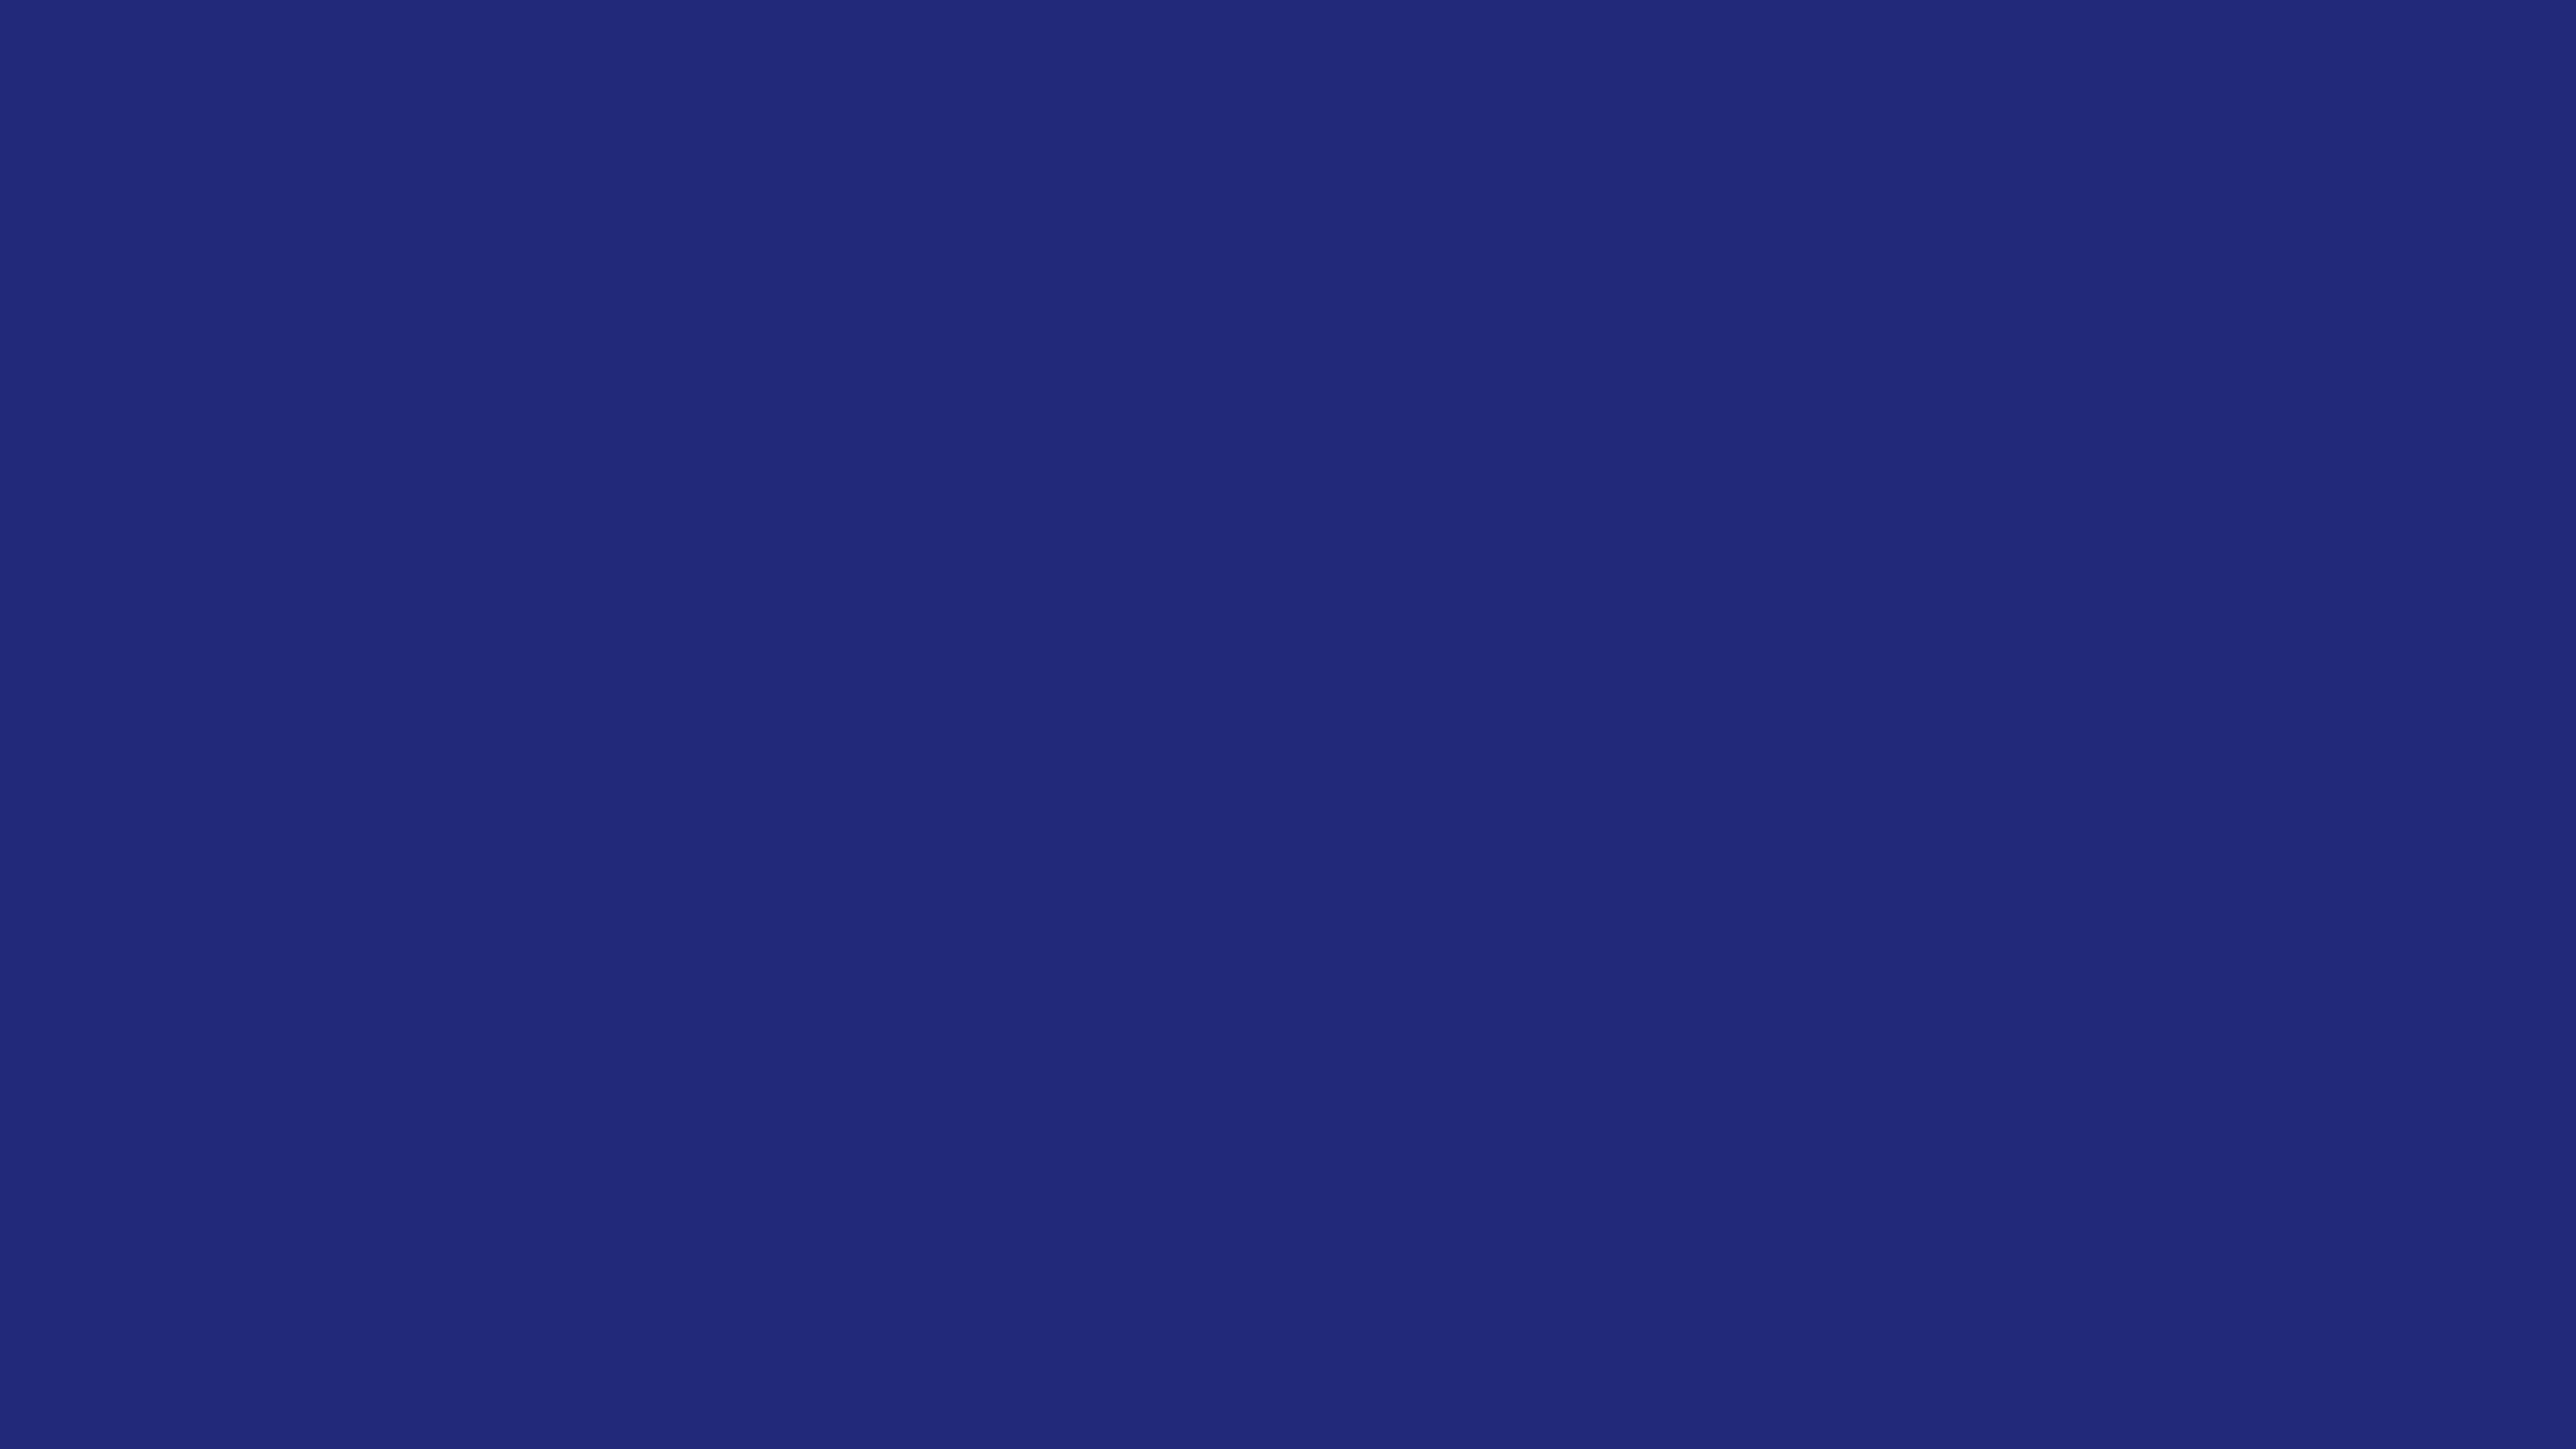 4096x2304 St Patricks Blue Solid Color Background